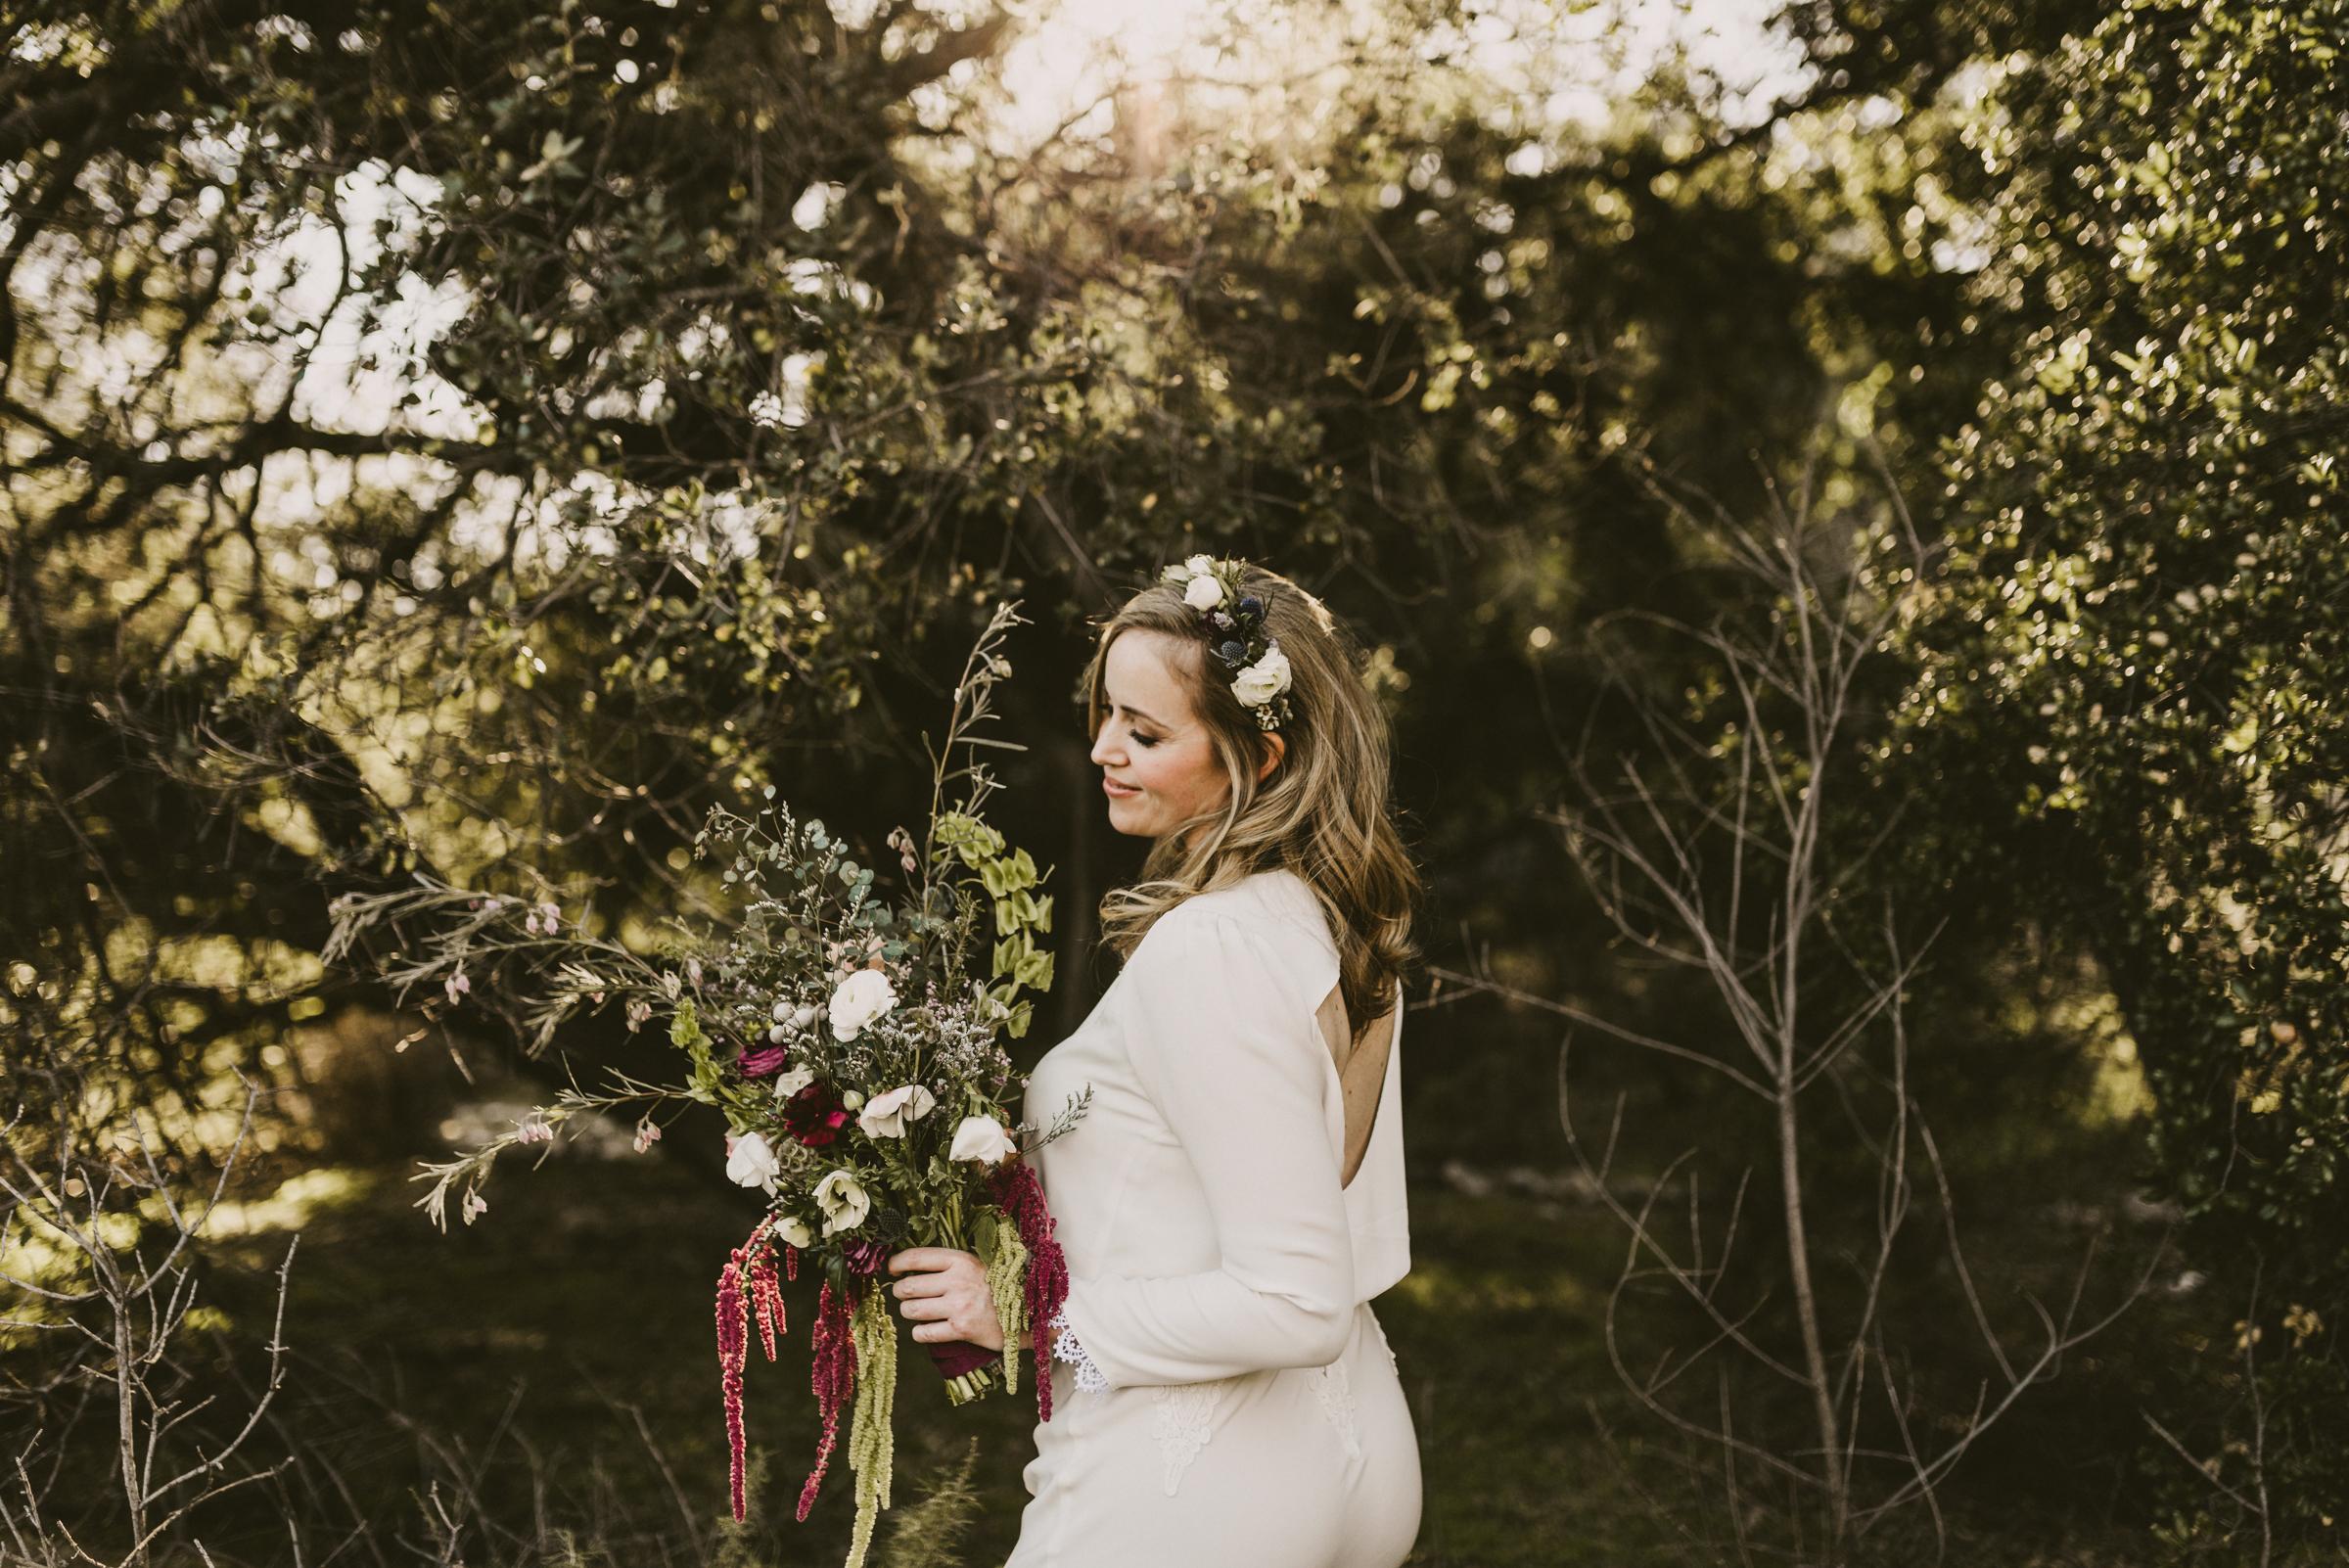 ©Isaiah + Taylor Photography - Intimate Elopement, Eaton Canyon, Los Angeles Wedding Photographer-5.jpg